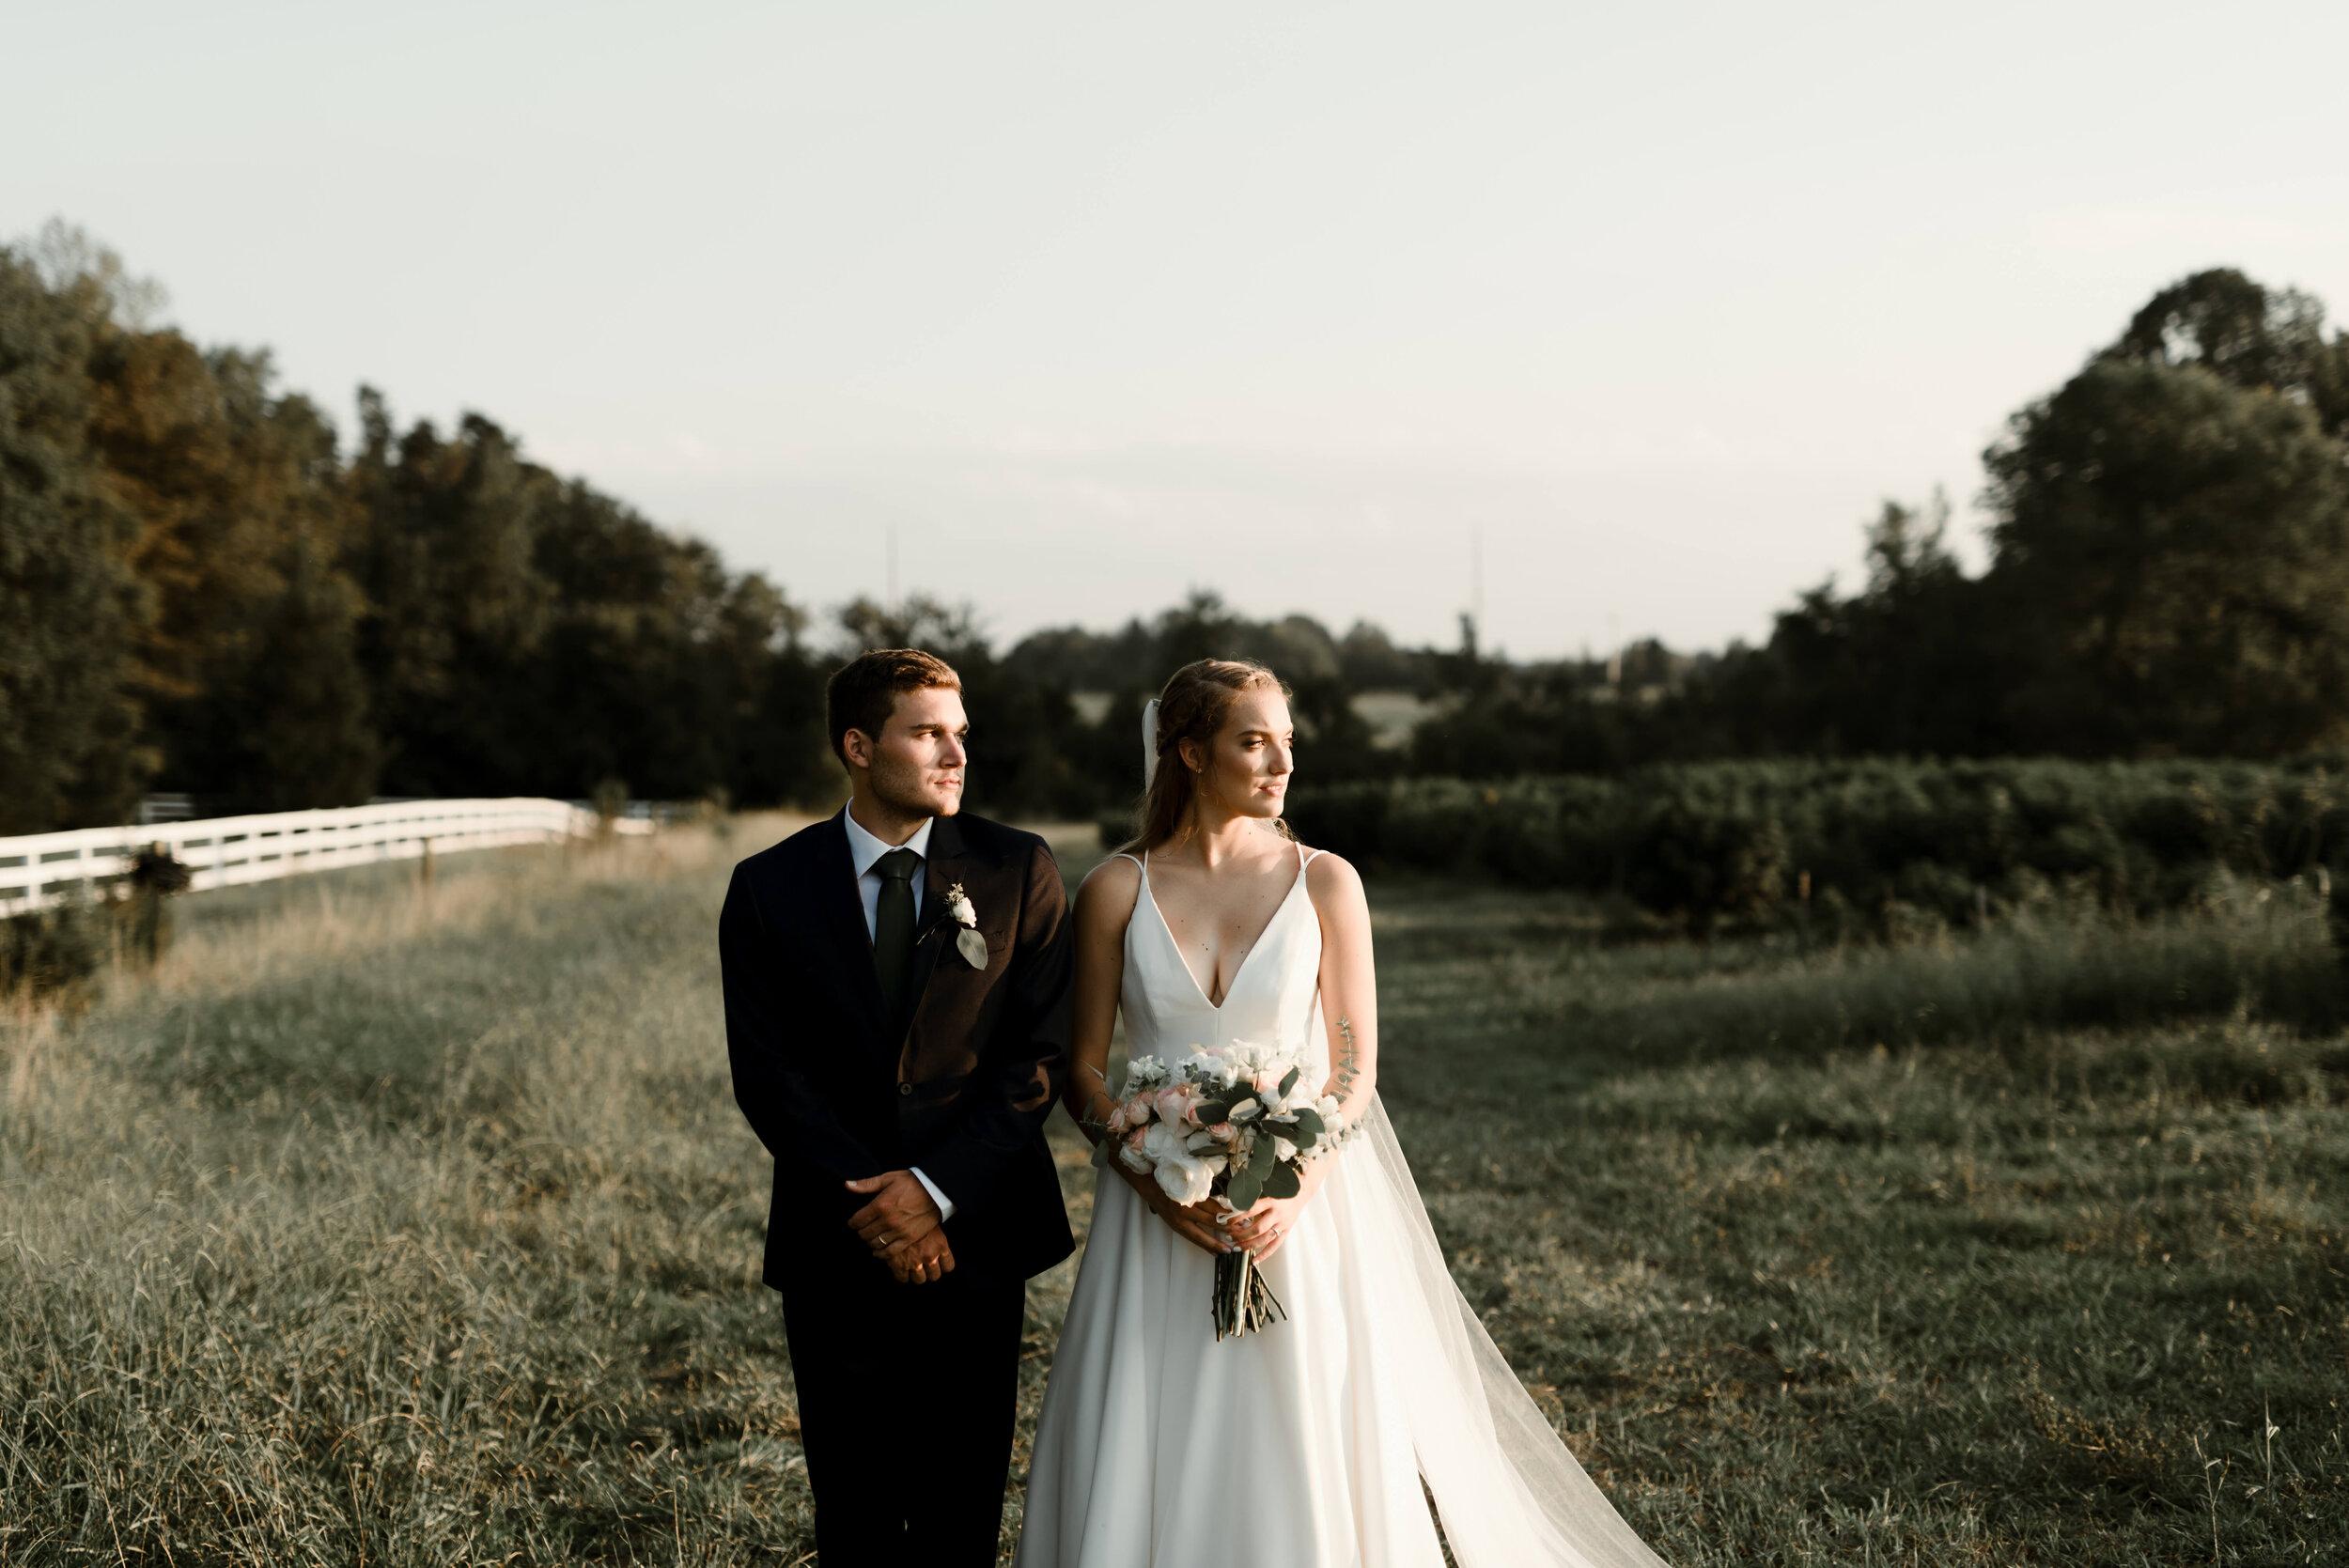 RALEIGH_WEDDING_GABBY_AND_SMITTYDSC_7895.jpg